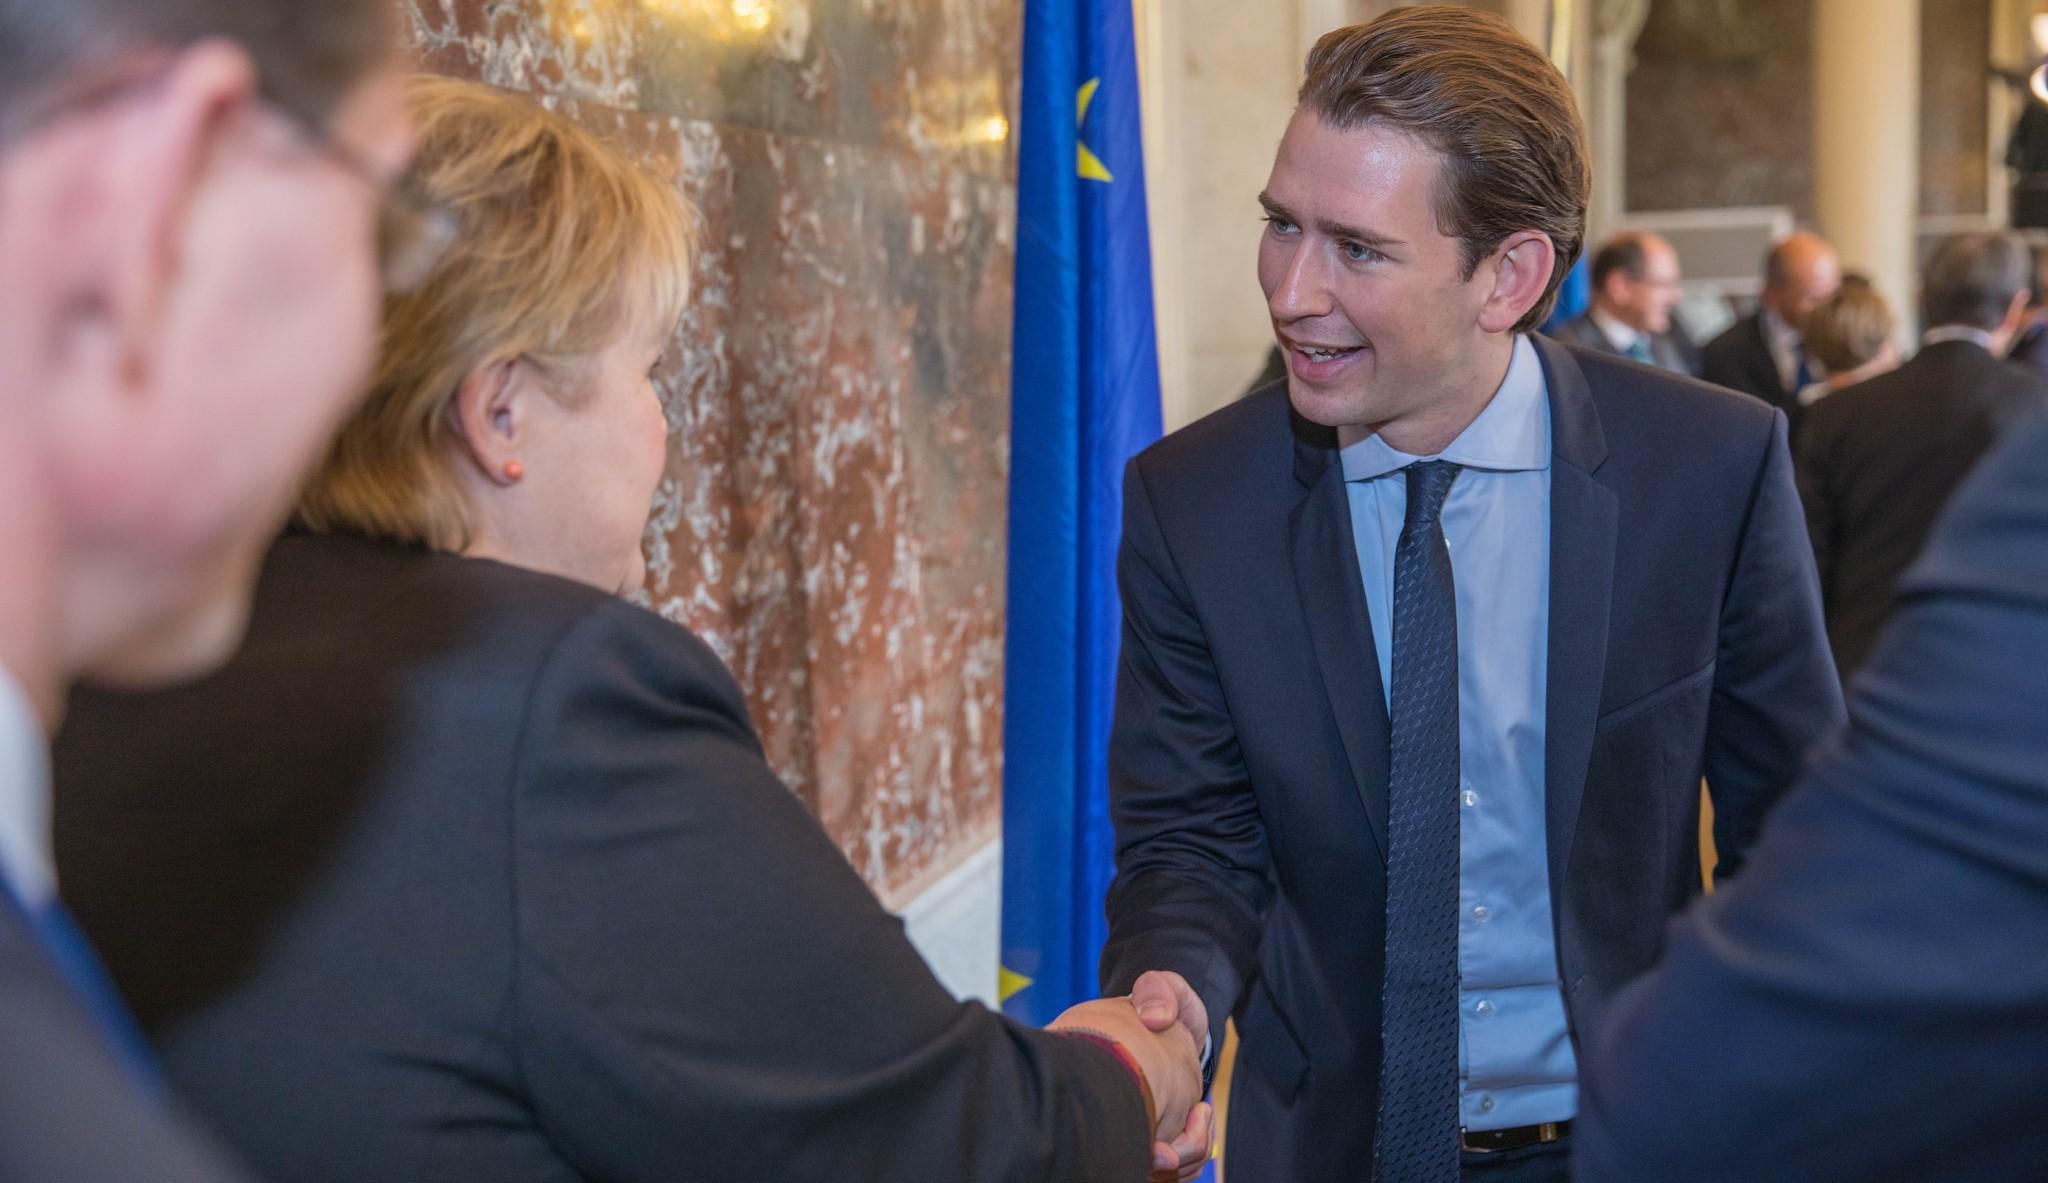 Incoming Chancellor of Austria Sebastian Kurz, October 2017 (Photo: European People's Party/Flickr)